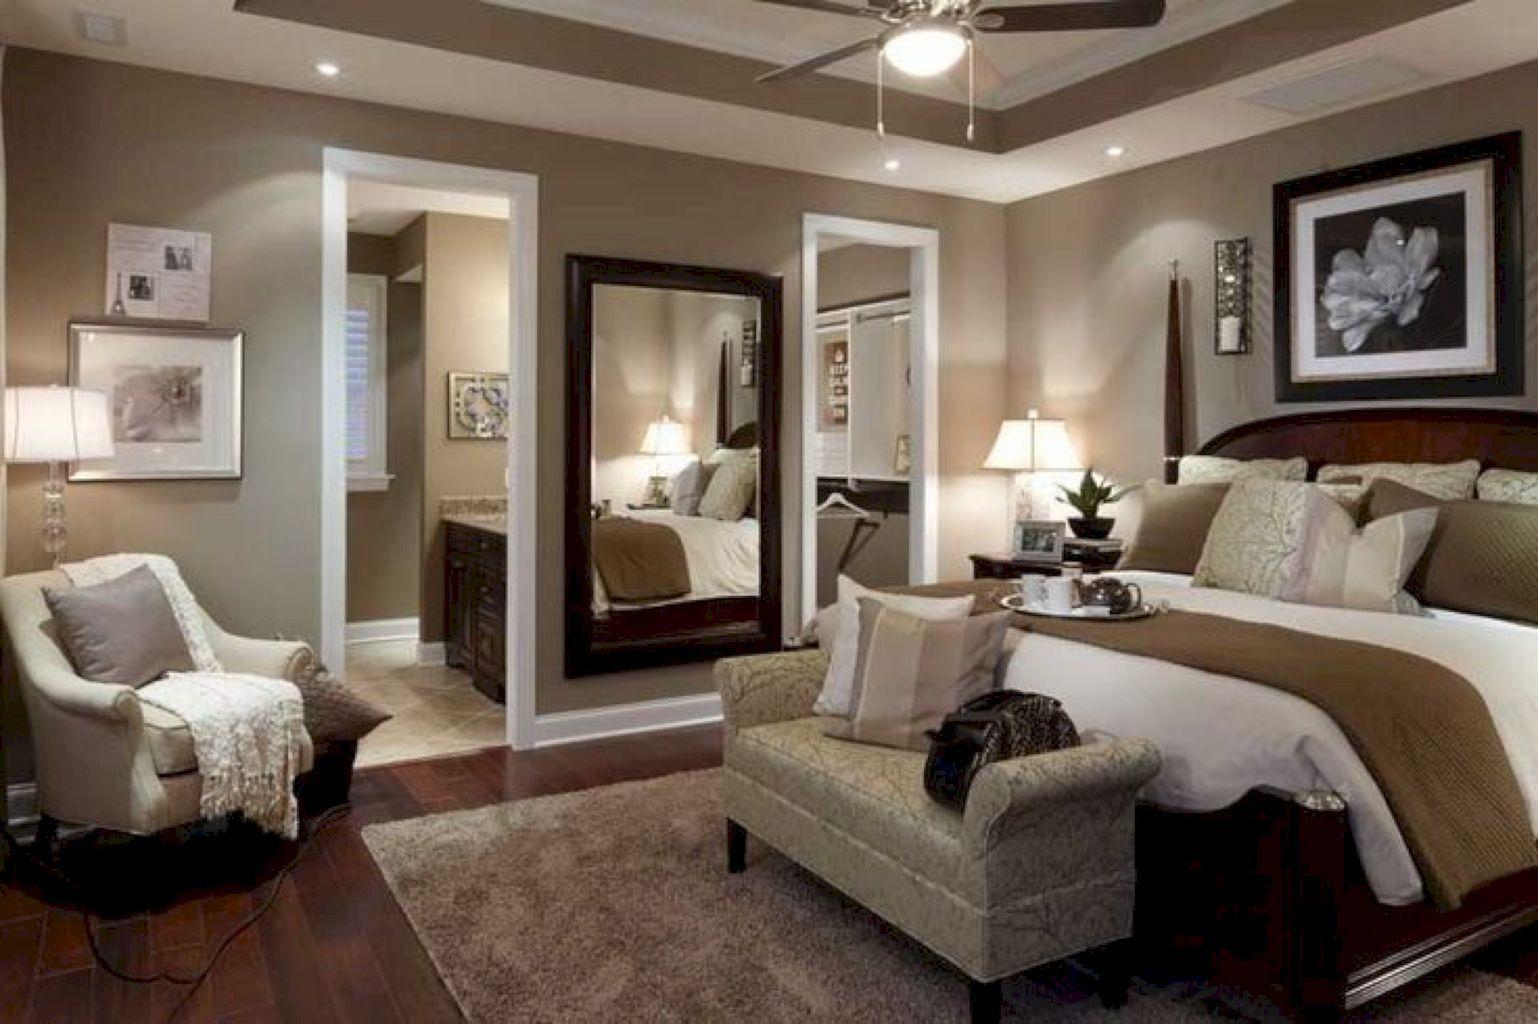 Master bedroom decor   Amazing Master Bedroom Decor Ideas  Master bedroom Bedrooms and